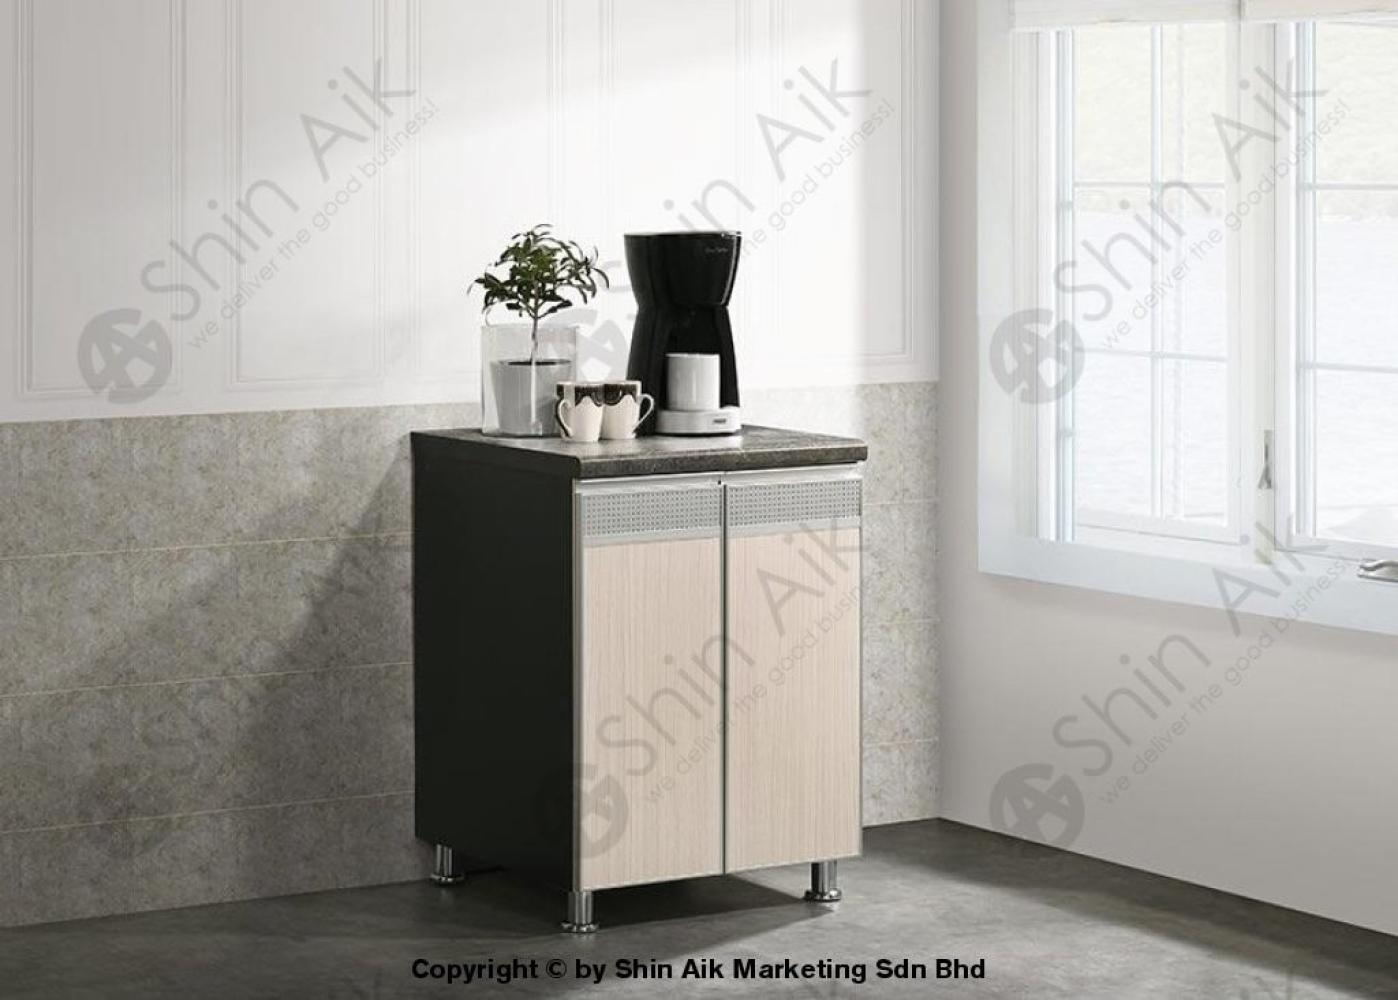 Ash & Grey Two-Tone Modular Low Kitchen Cabinet (2'ft) - SA3318-223